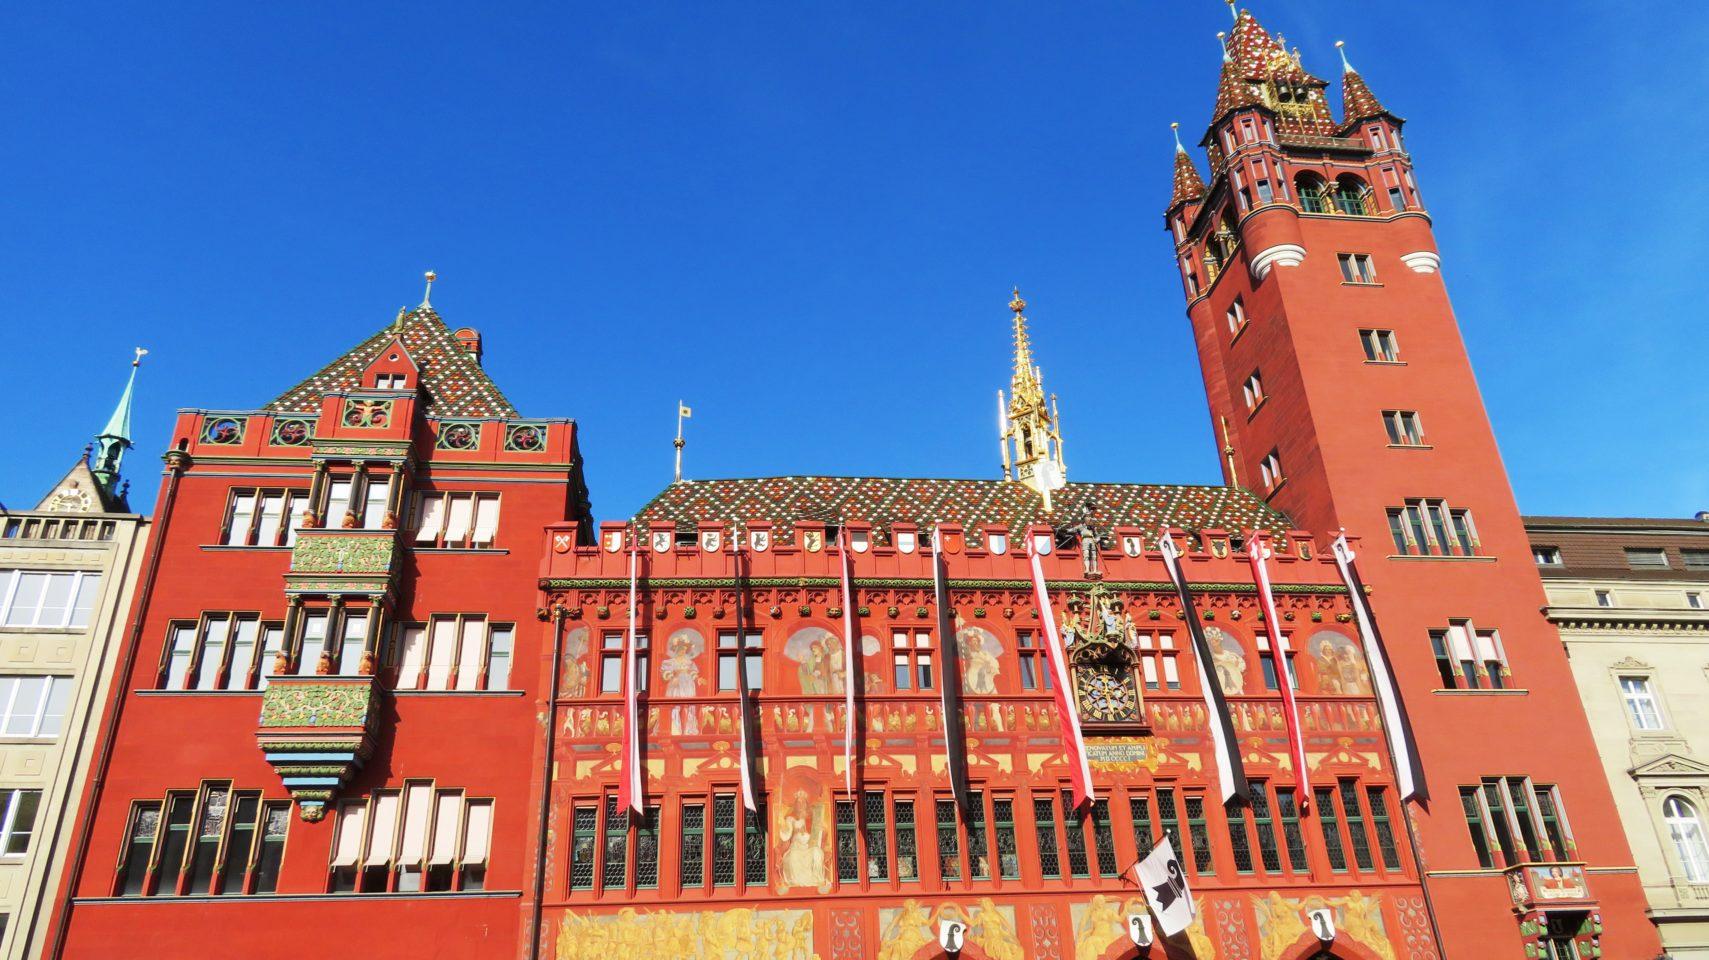 Red Town Hall (RatHaus) on Marketplatz in <em><strong>Basel</strong></em>, Switzerland